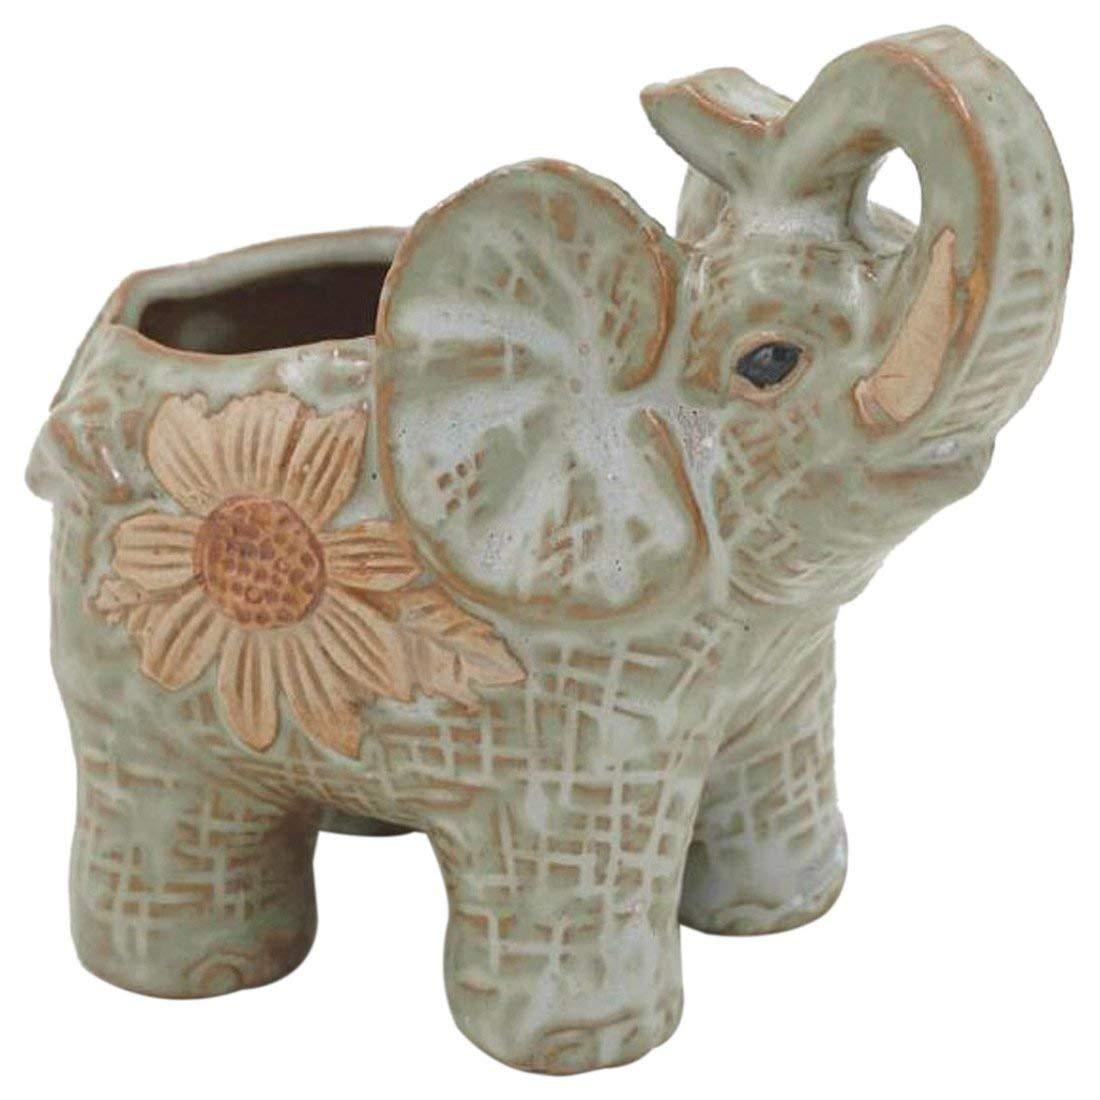 TOOGOO(R) Ceramic Mini Elephant Cacti Succulent Plant Pot Flower Planter Garden Home Decor